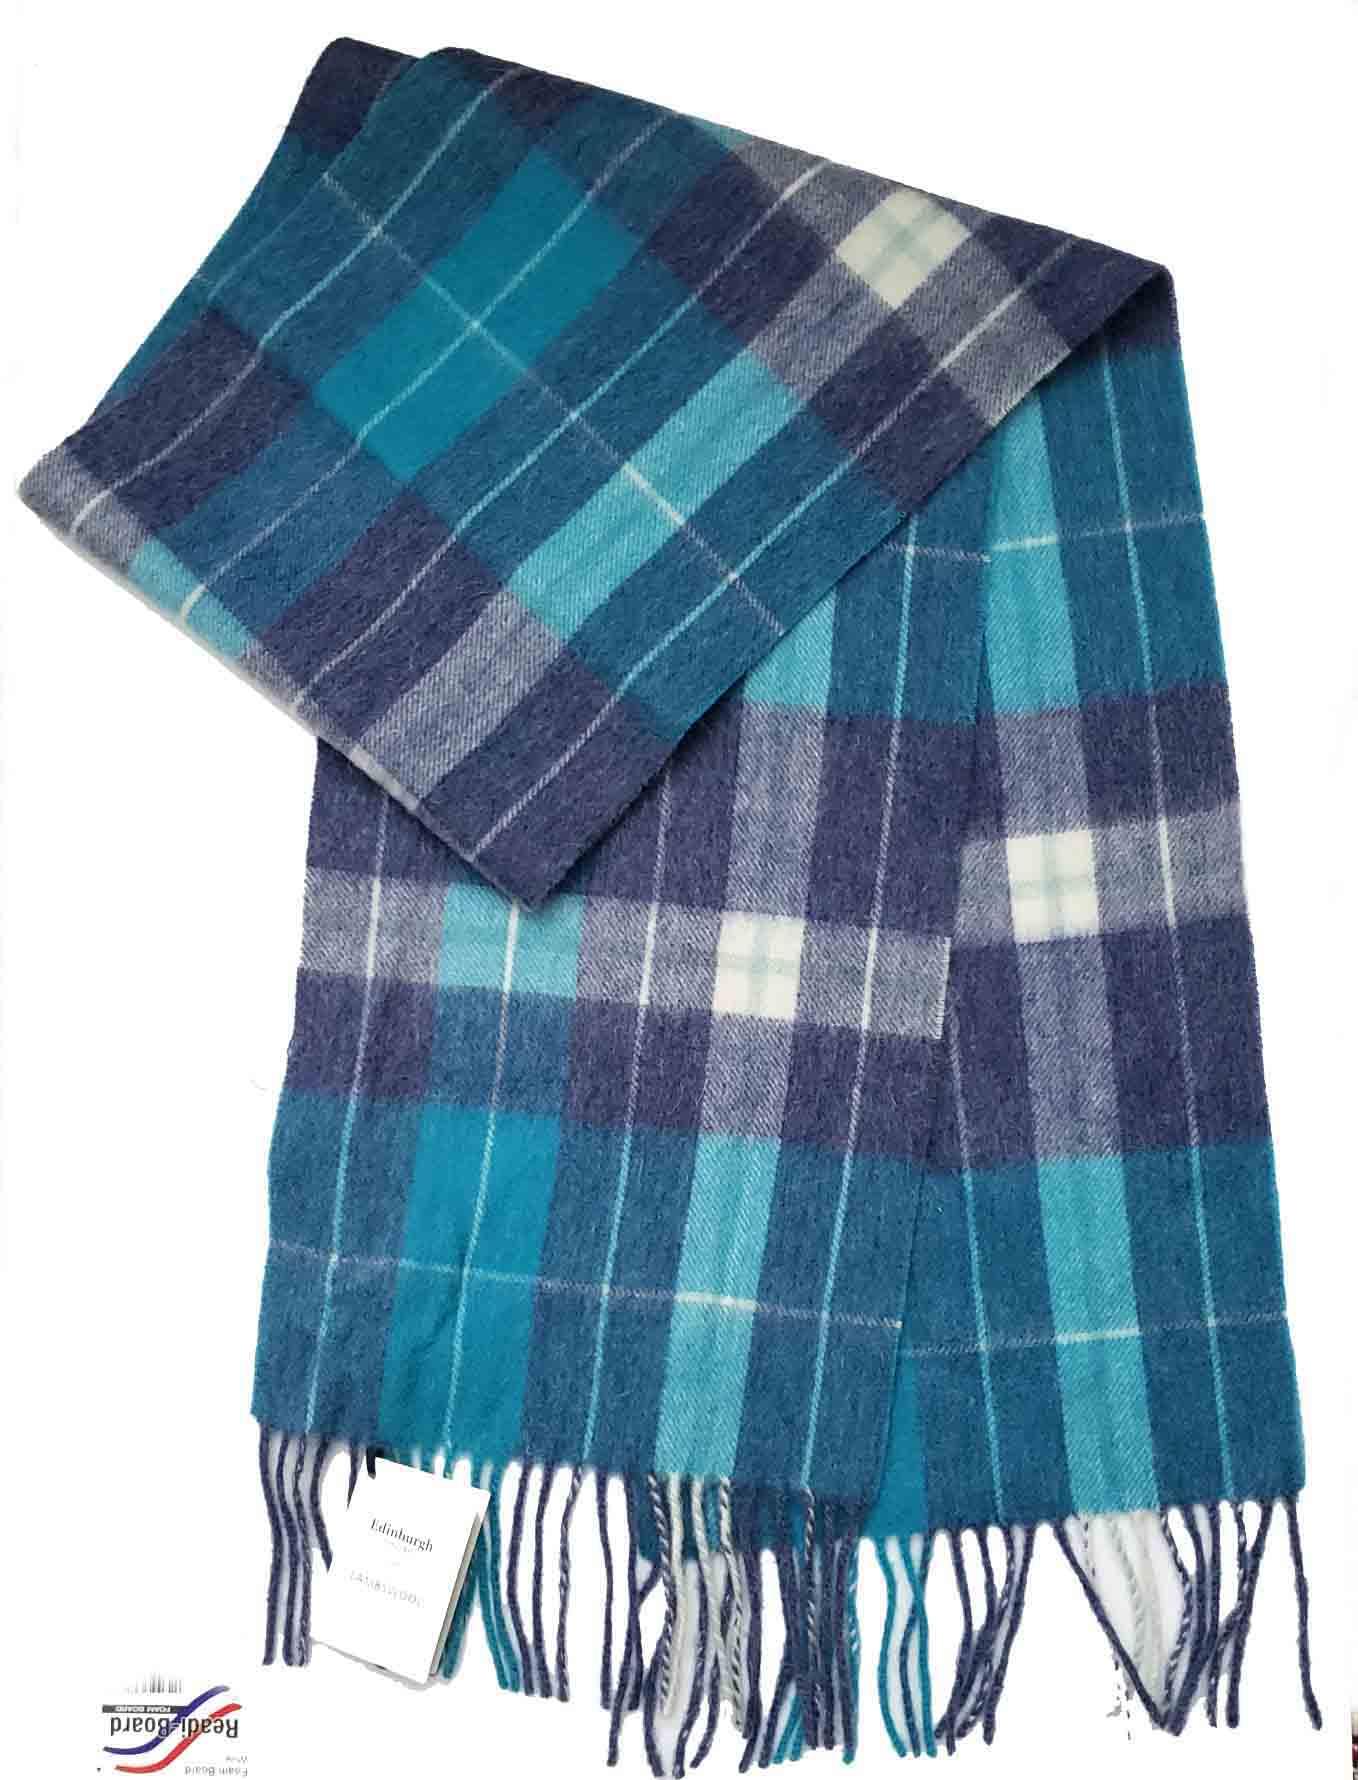 Edinburgh Scotland Lambswool Tartan Plaid Blue White Green Gray Men's